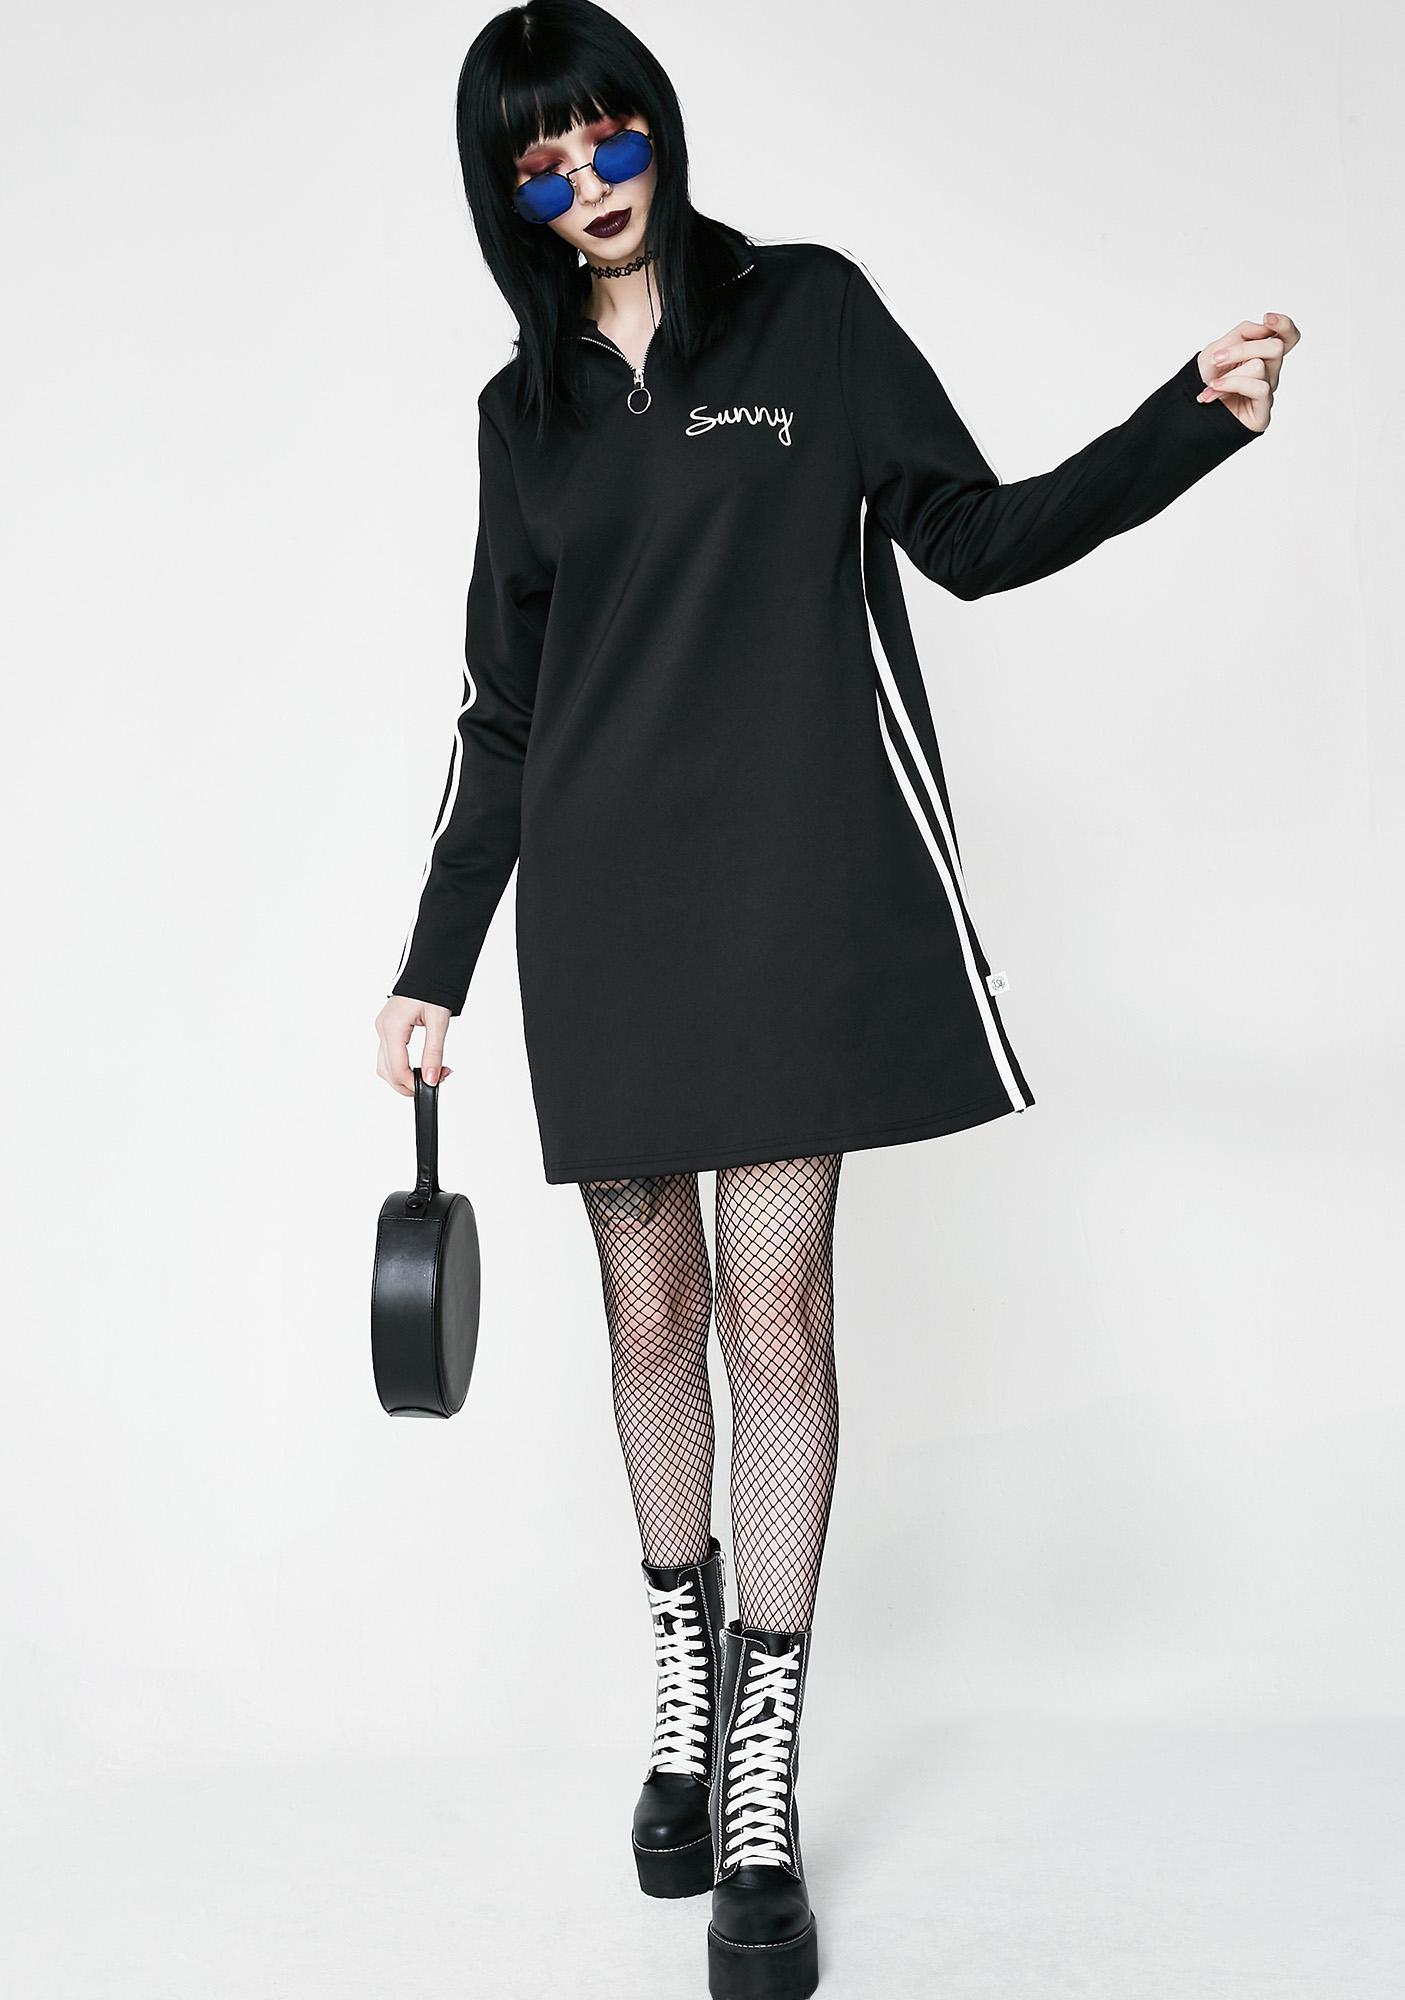 Little Sunny Bite Sporty Zip Dress